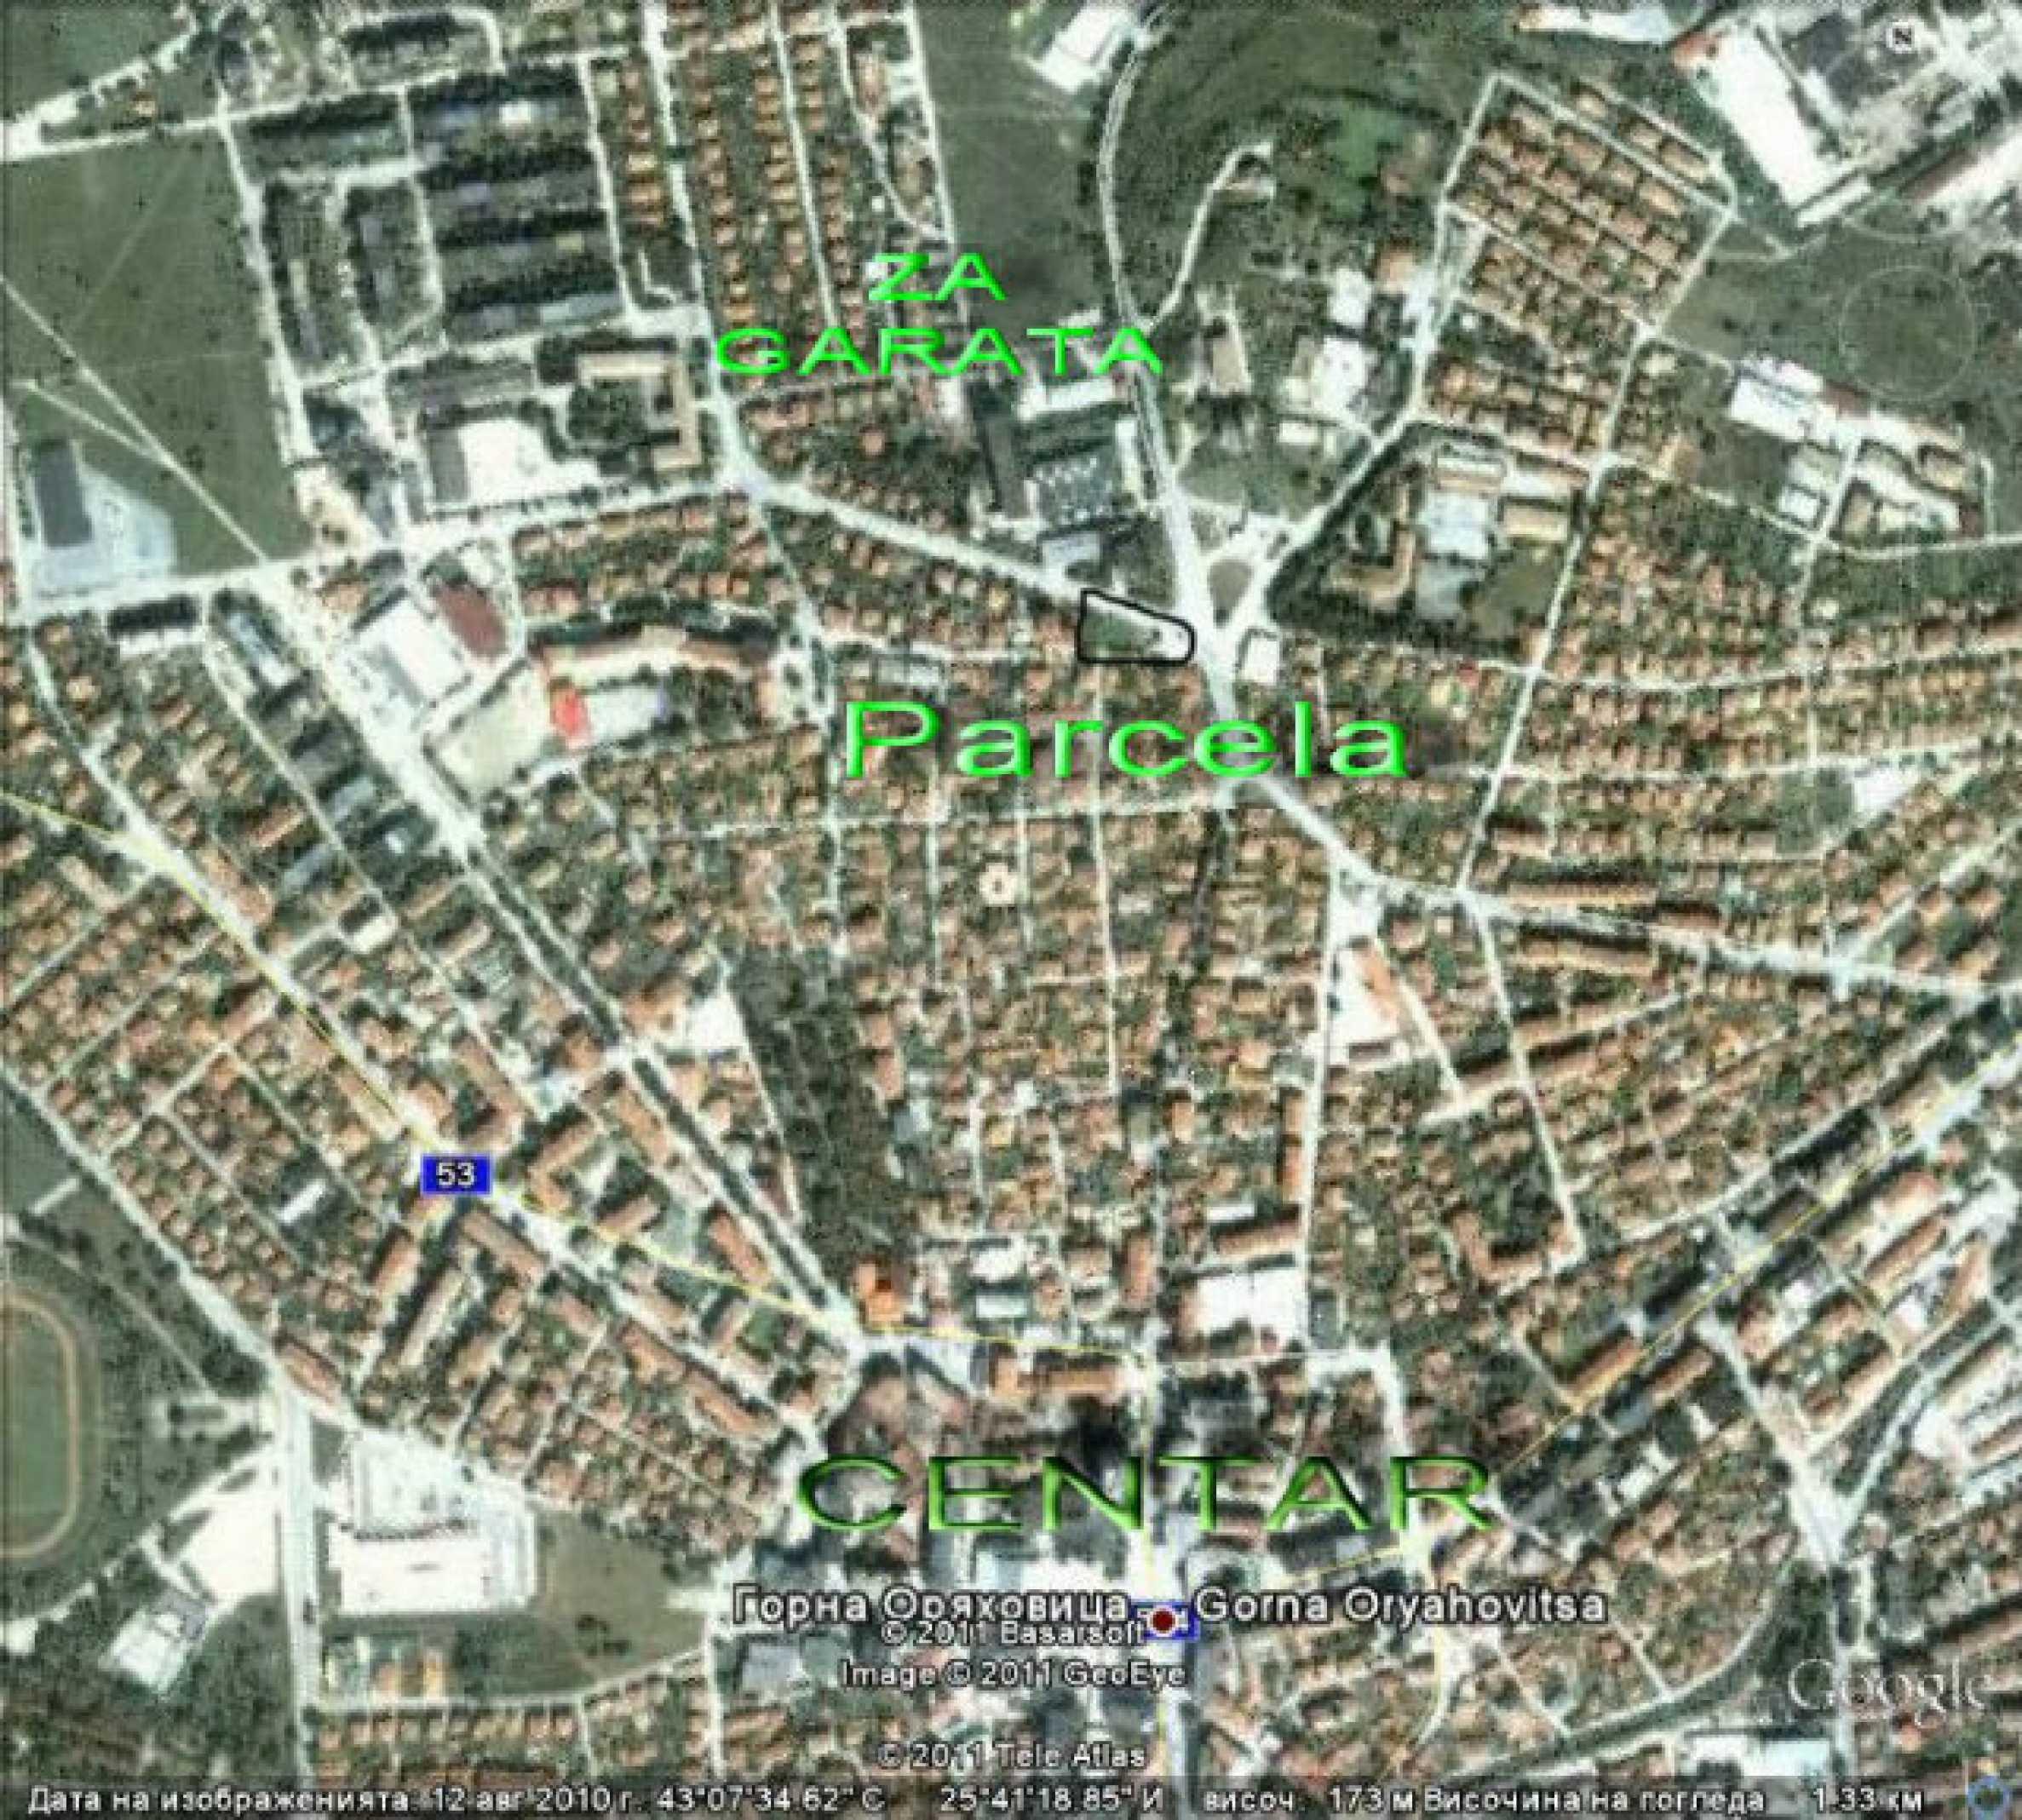 Geregeltes Baugrundstück in Gorna Oryahovitsa 2